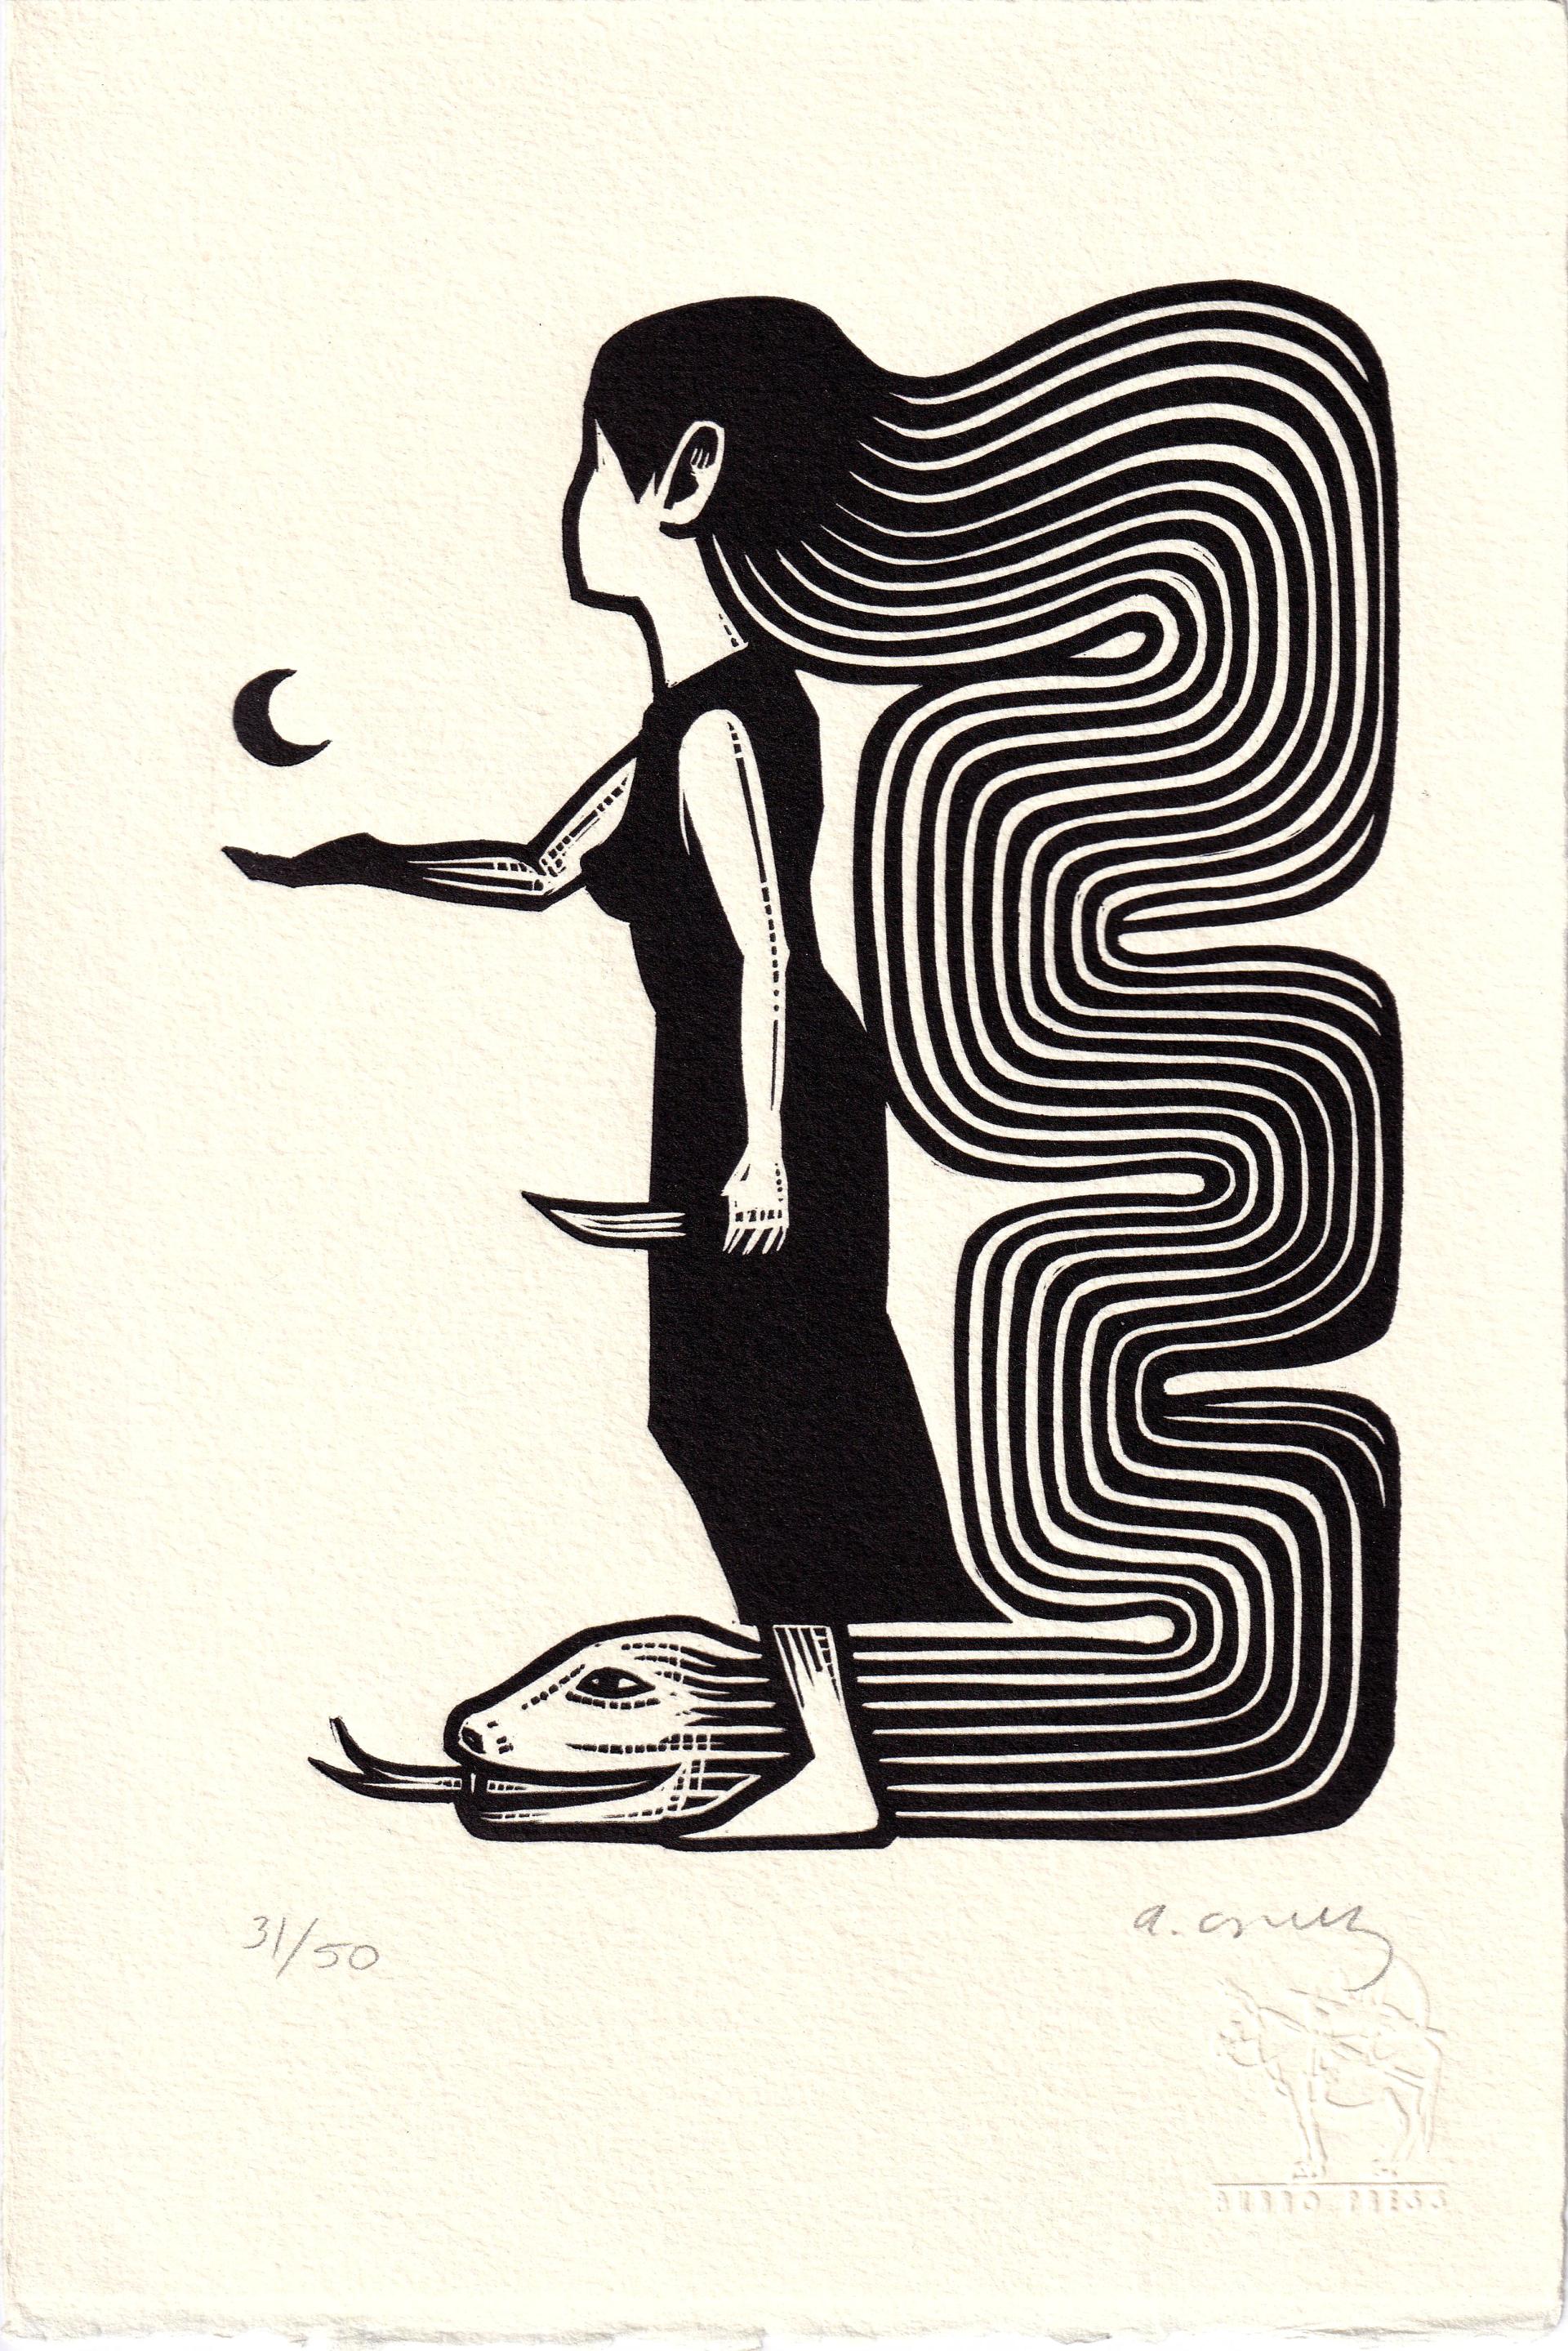 Untitled (Luna Serpiente) by Alberto Cruz